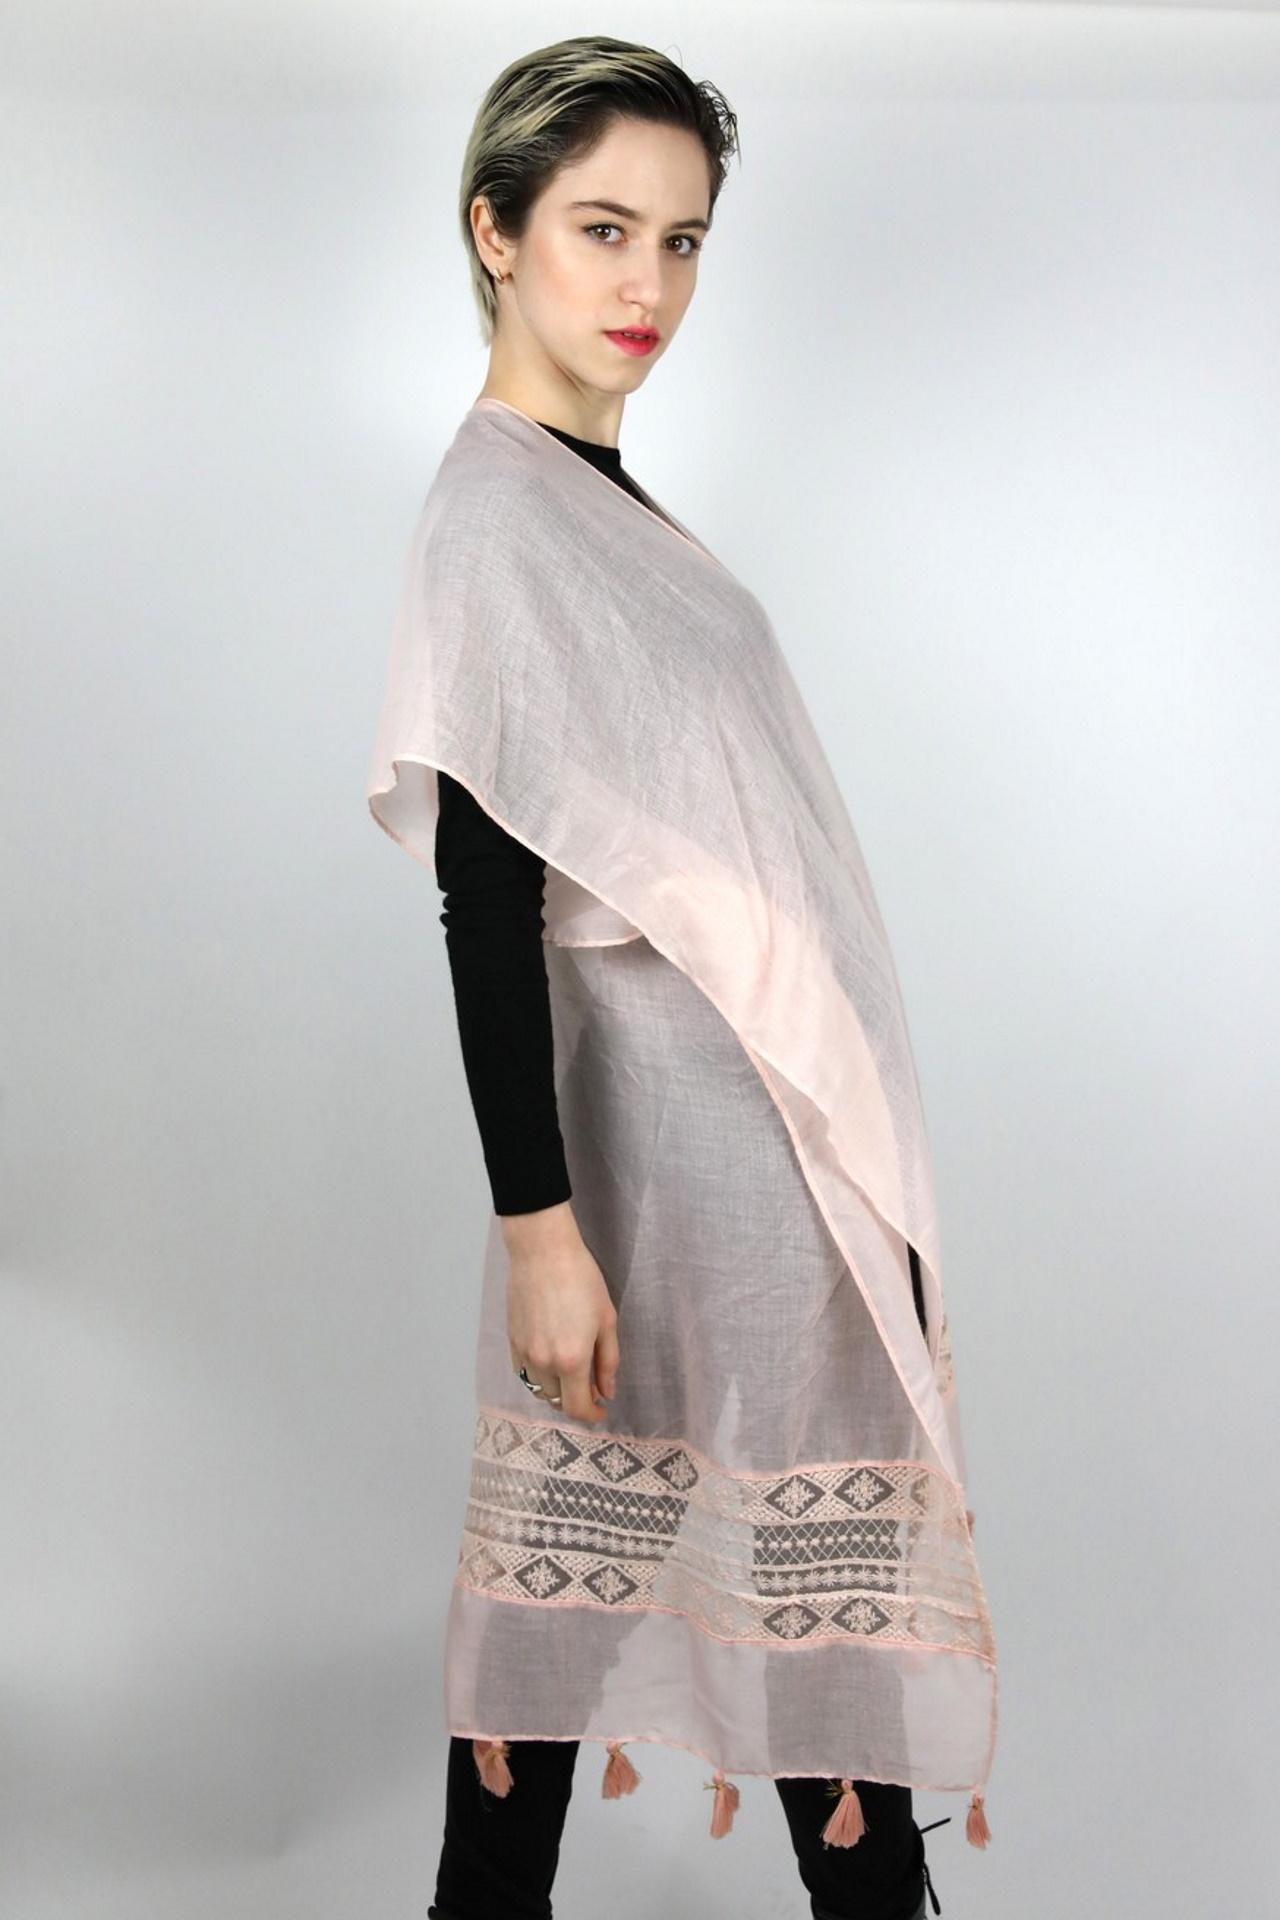 CLOTHES174 STOLA DONNA FOULARD CARDIGAN COPRISPALLE 3 1stAmerican elegante stola da donna foulard cardigan coprispalle